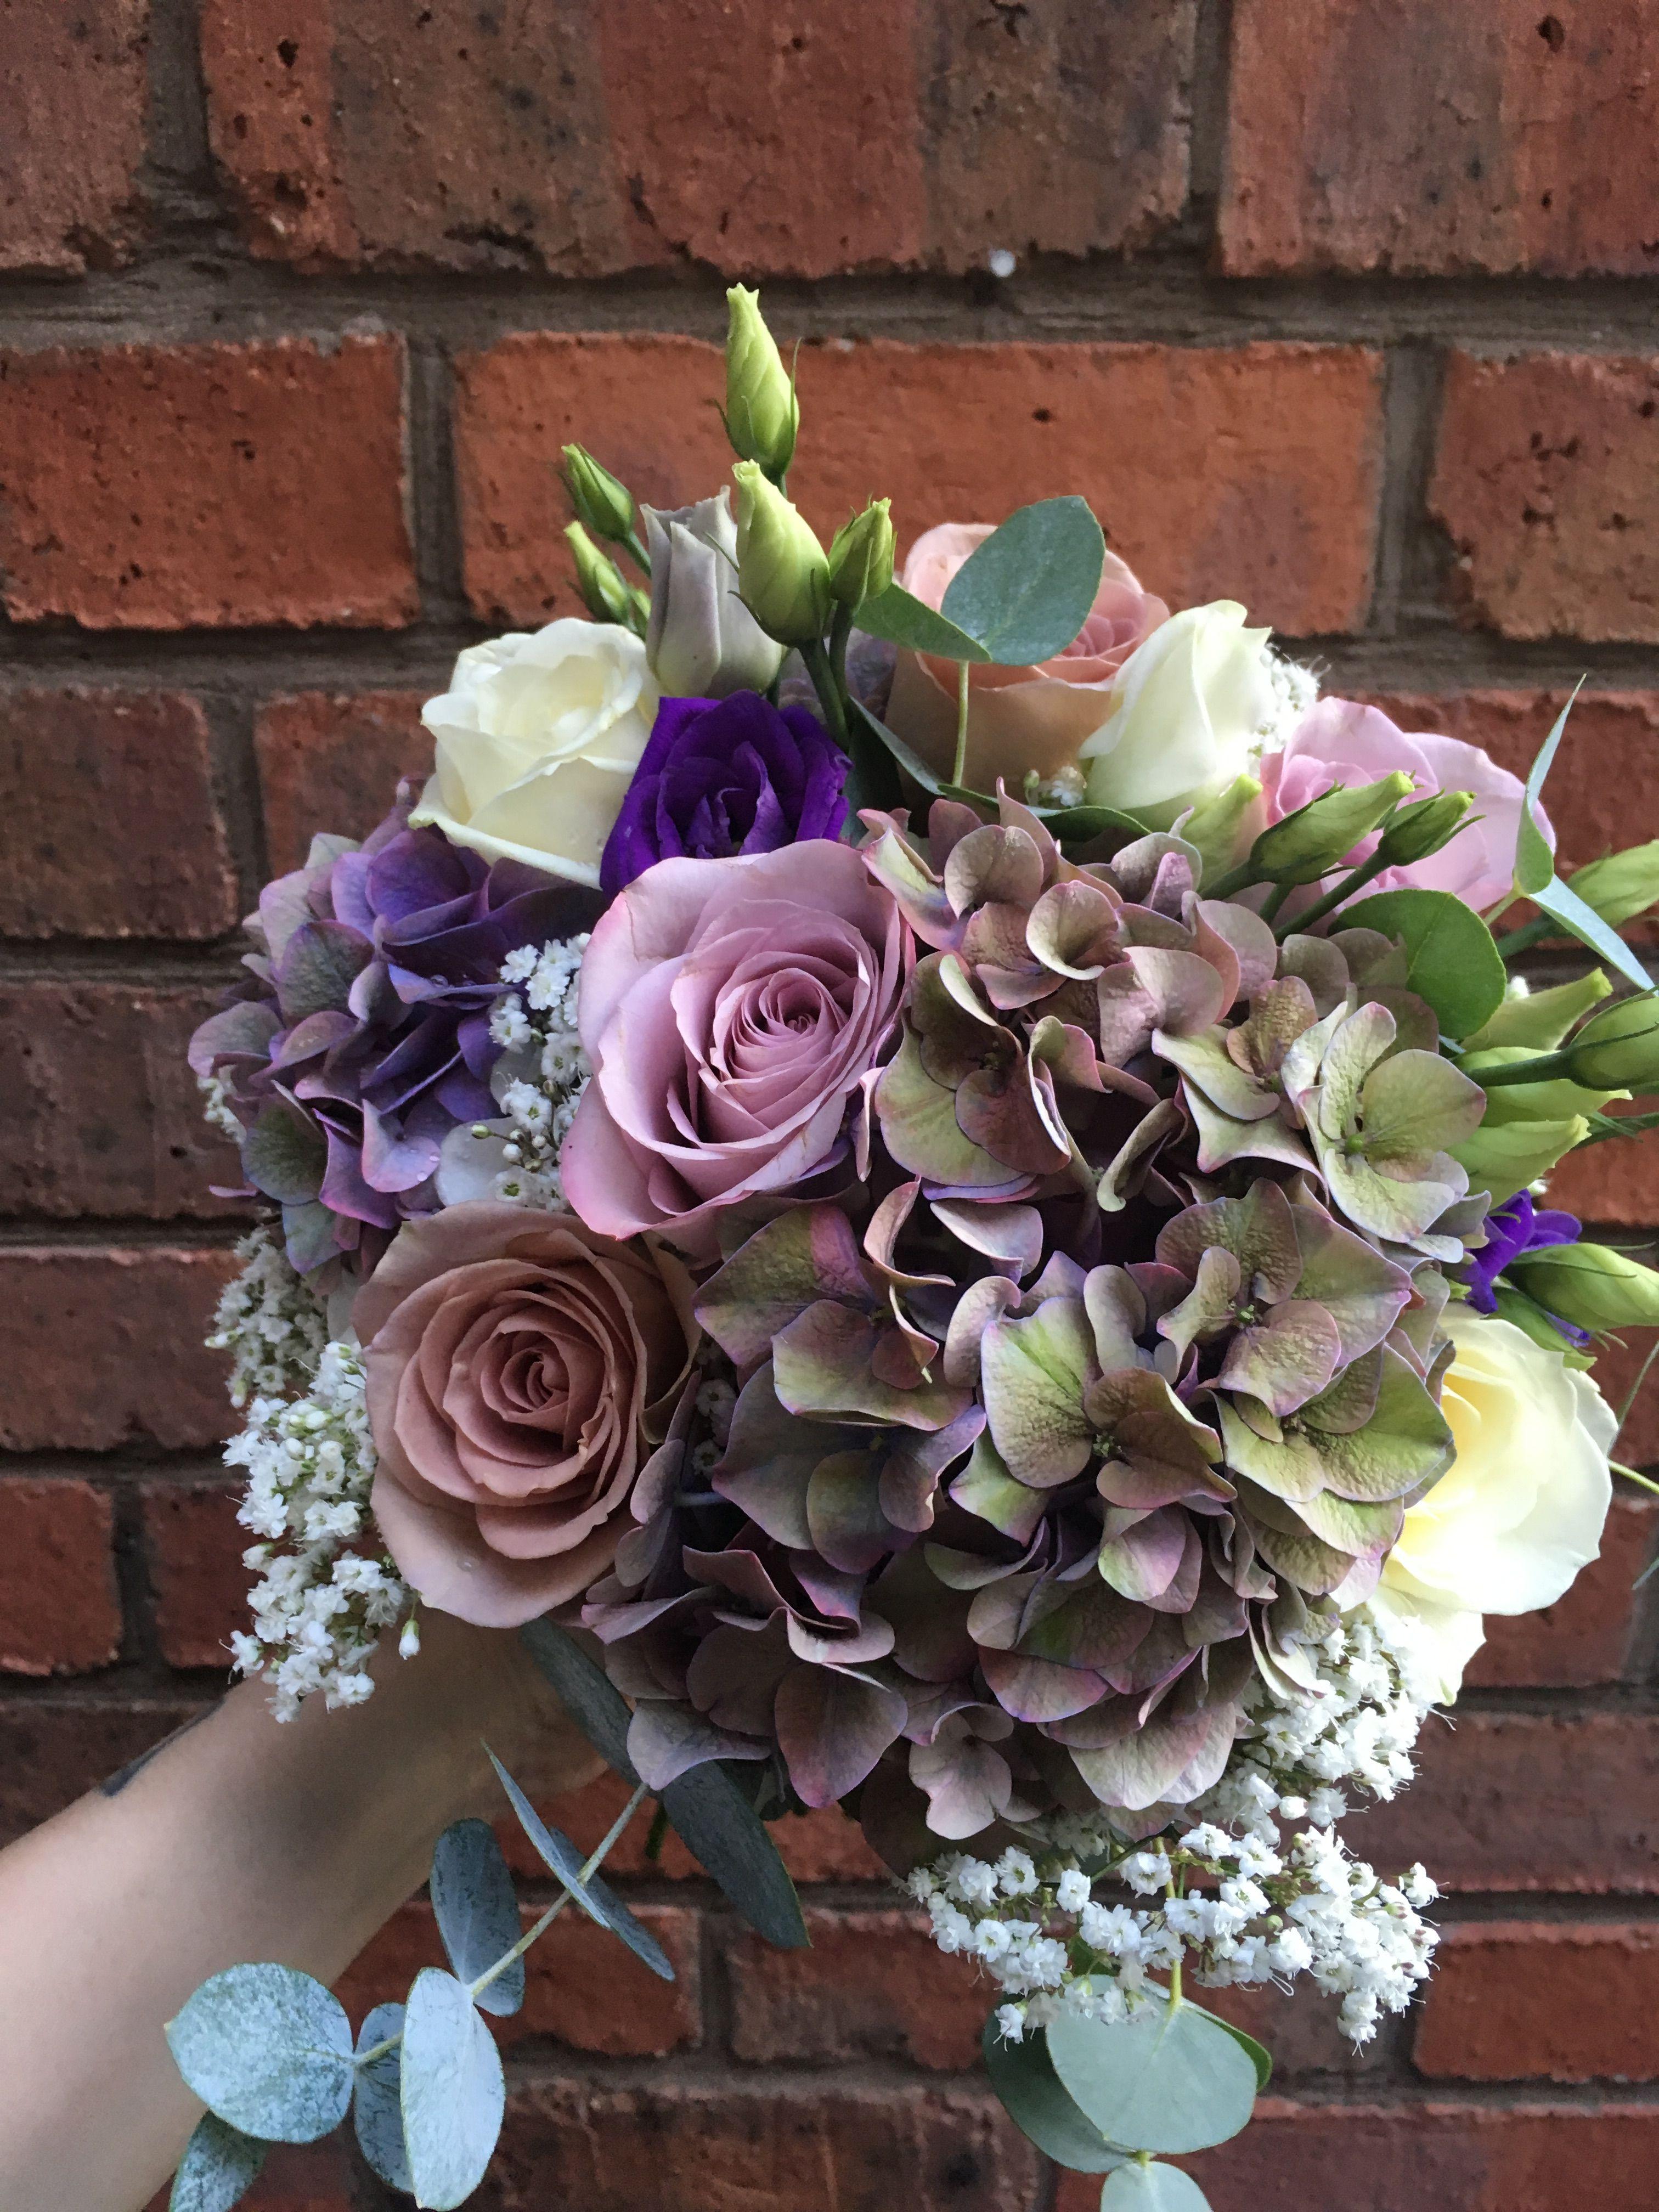 Bridal bouquet bridal flowers wedding flowers ivory and muted bridal bouquet bridal flowers wedding flowers ivory and muted lilac flowers purple izmirmasajfo